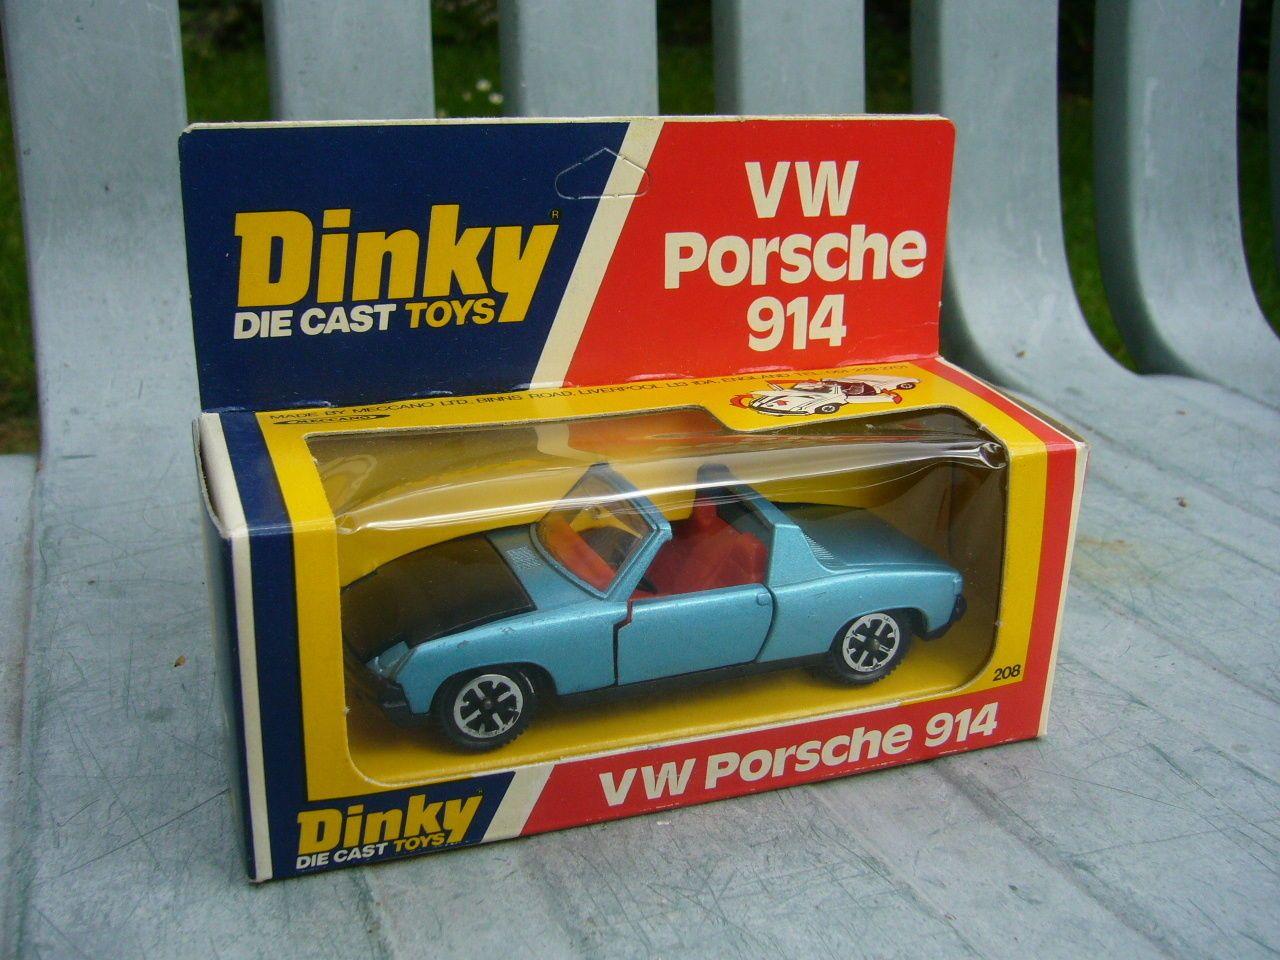 Dinky VW Porsche 914